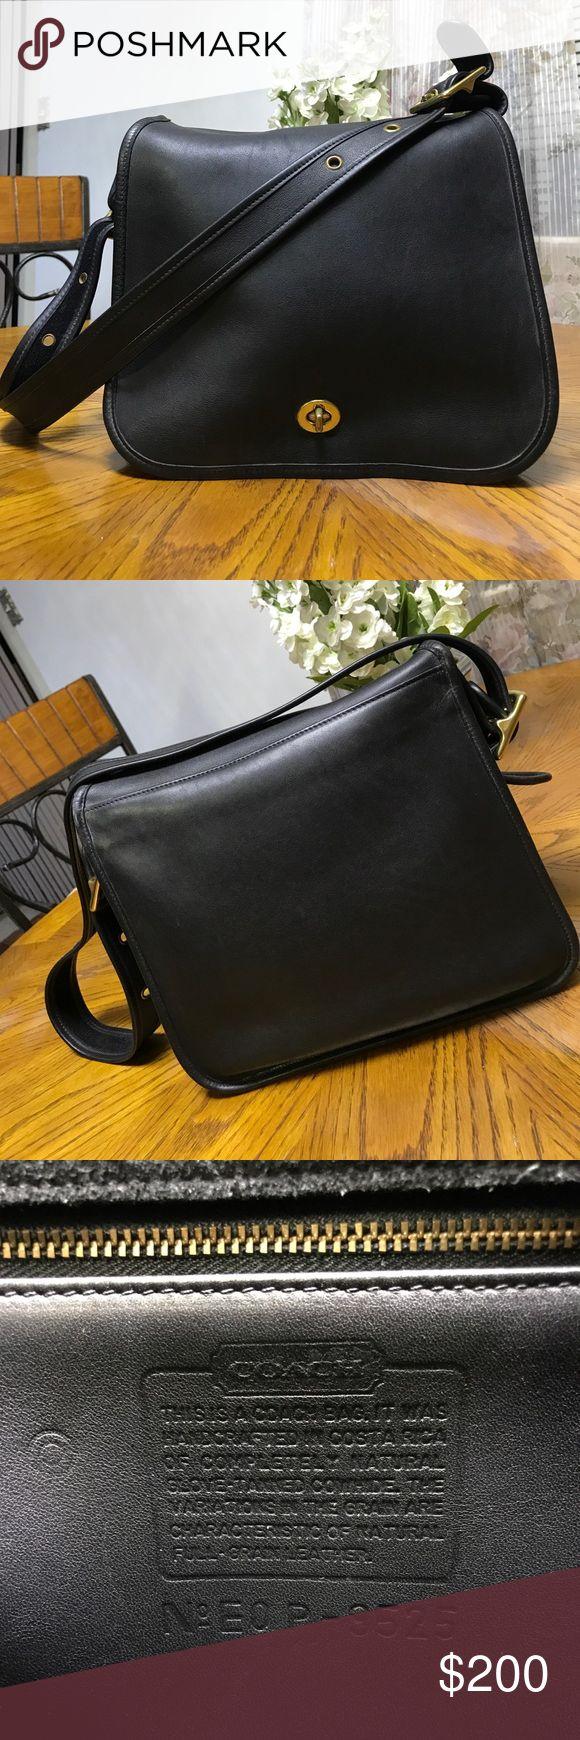 Authentic Coach Satchel Black & Gold real leather Coach satchel Coach Bags Satchels